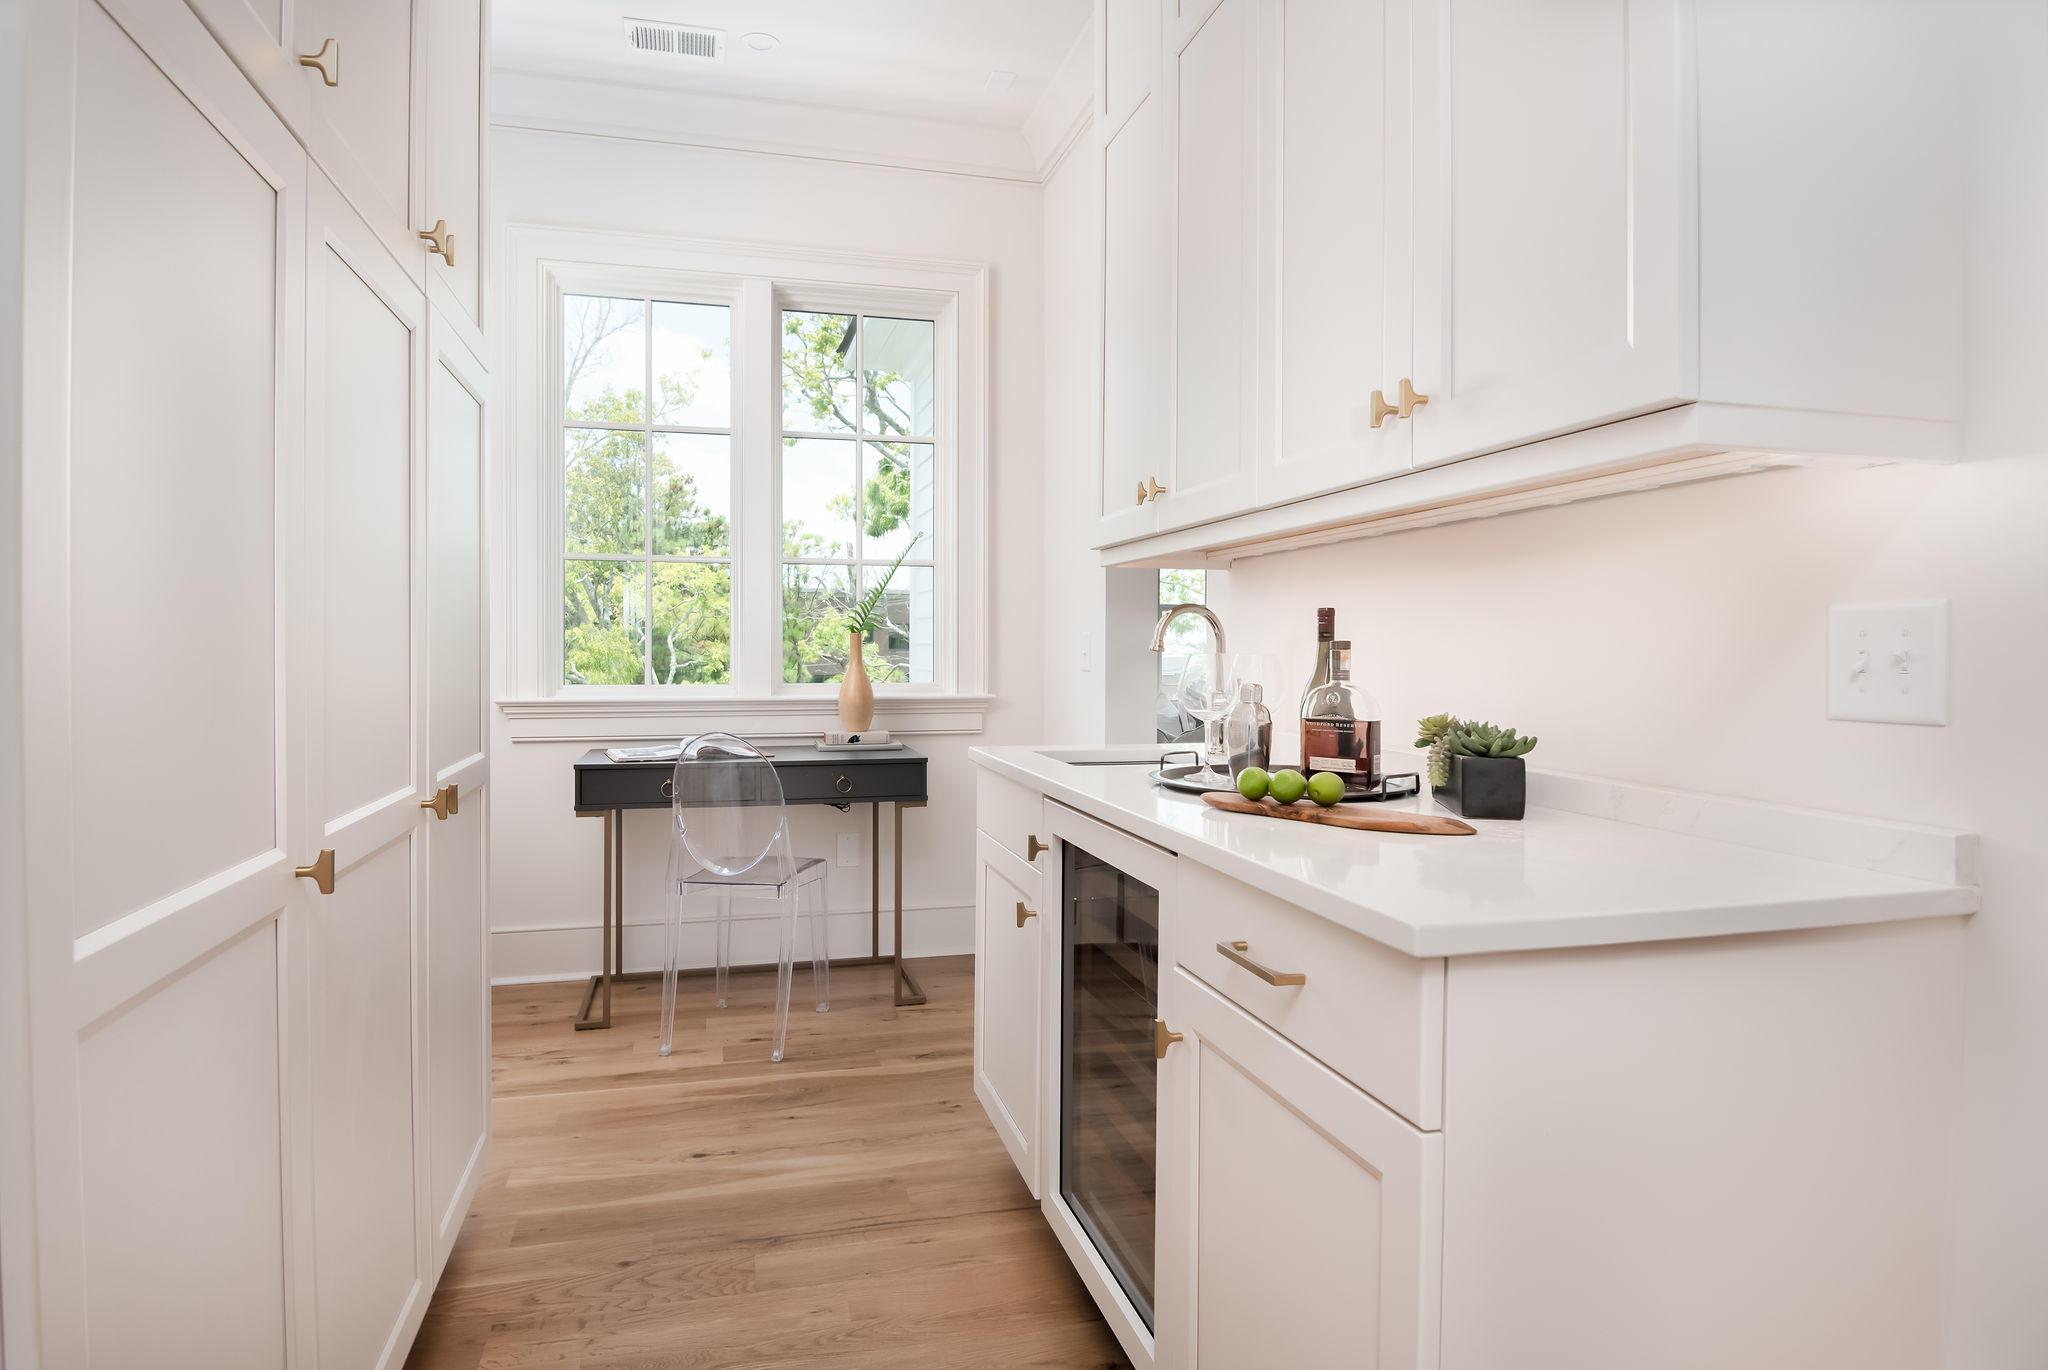 Harleston Village Homes For Sale - 55 Barre, Charleston, SC - 27